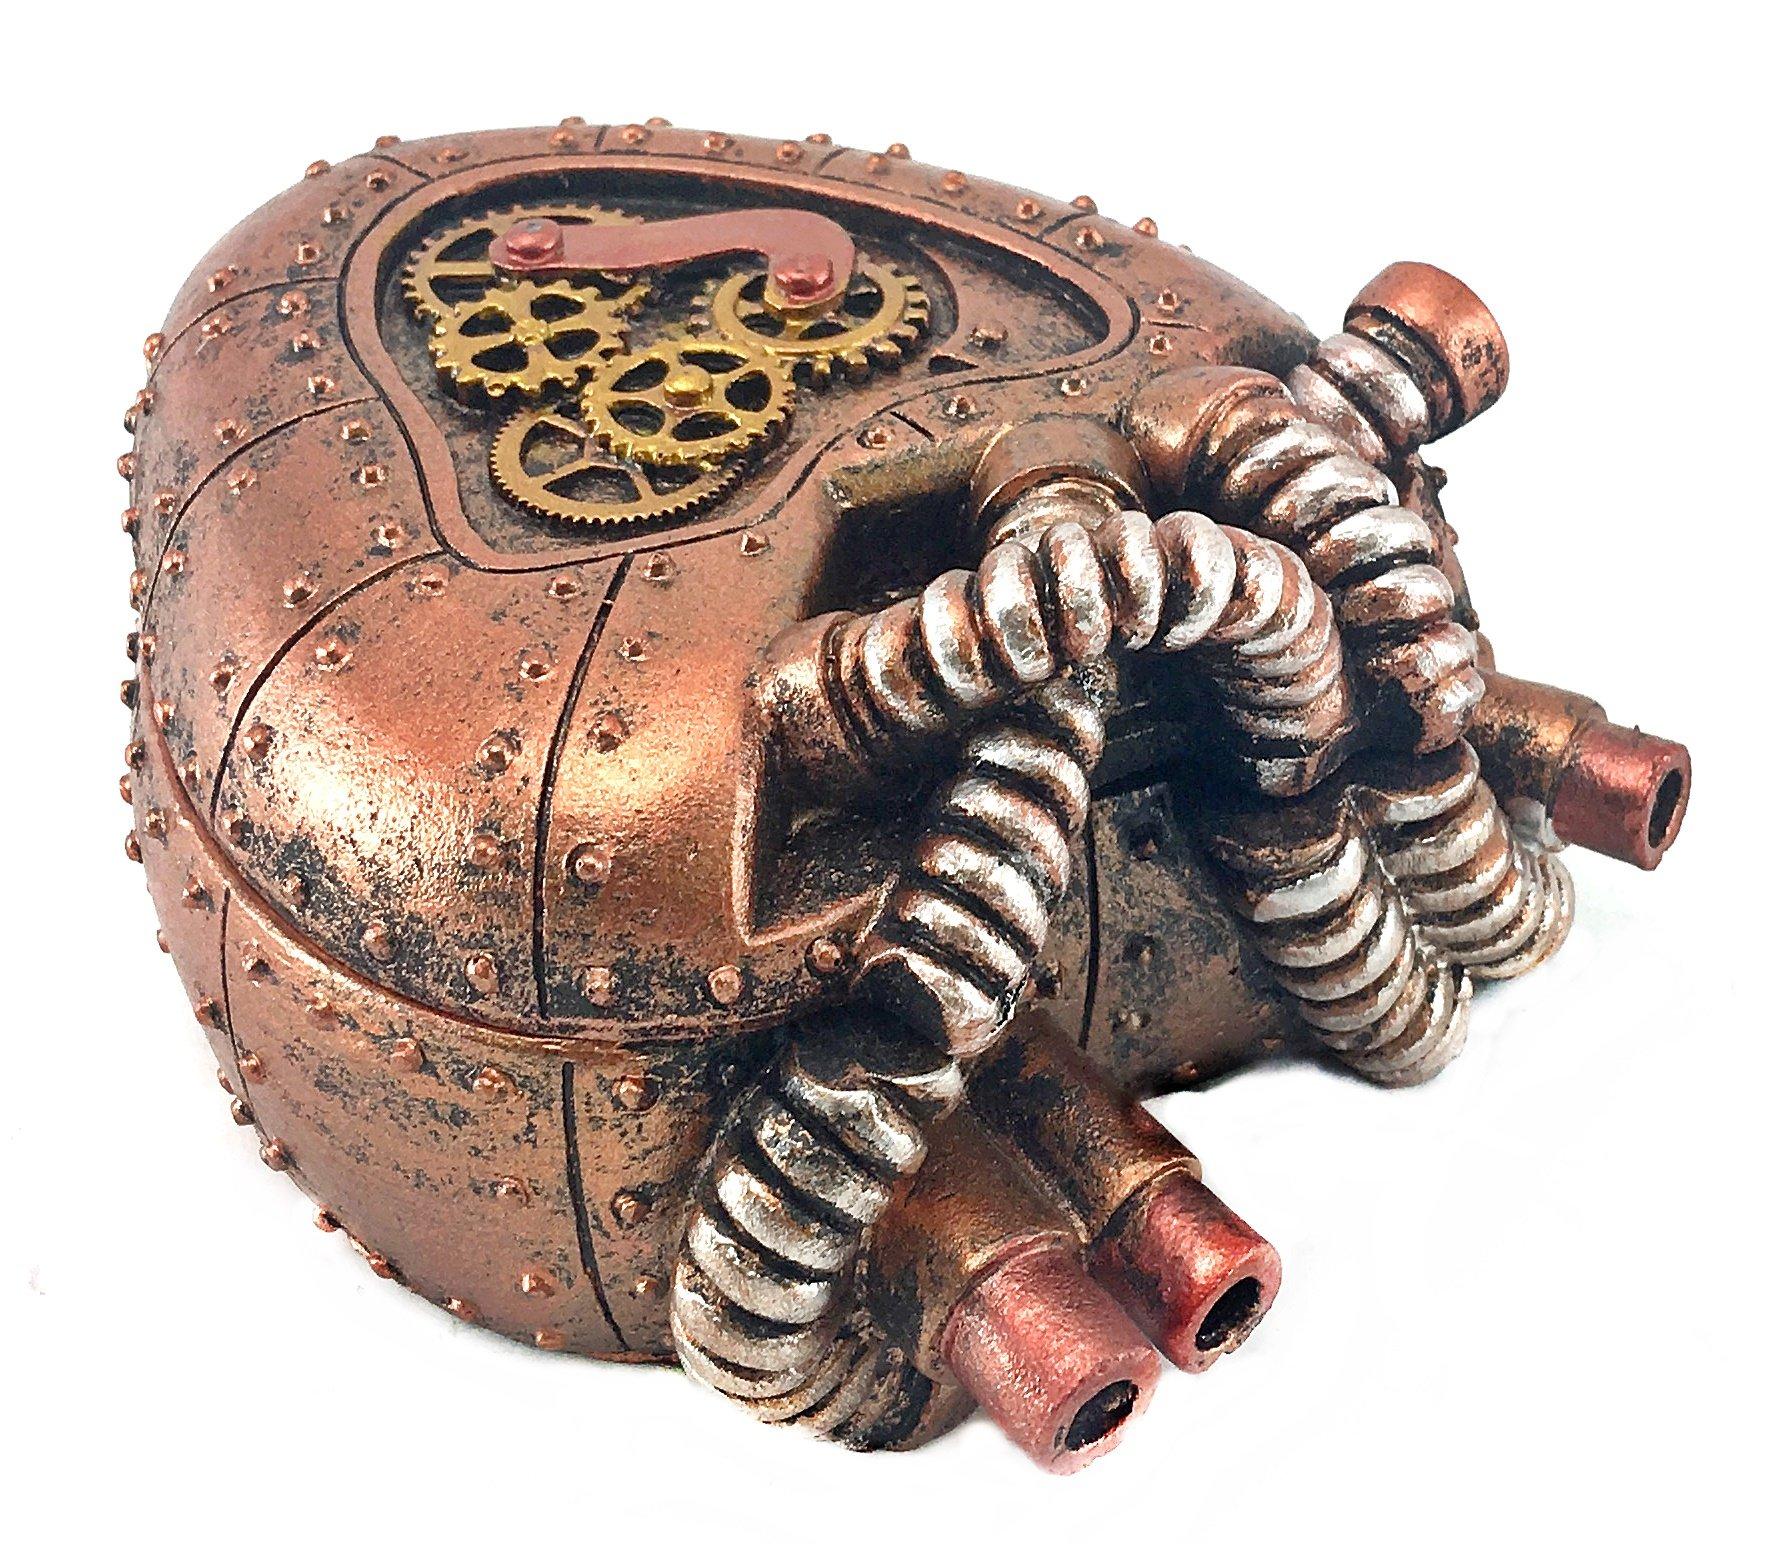 Bellaa 20980 Steampunk Heart Box Mechanical Industrial 4 inch 3